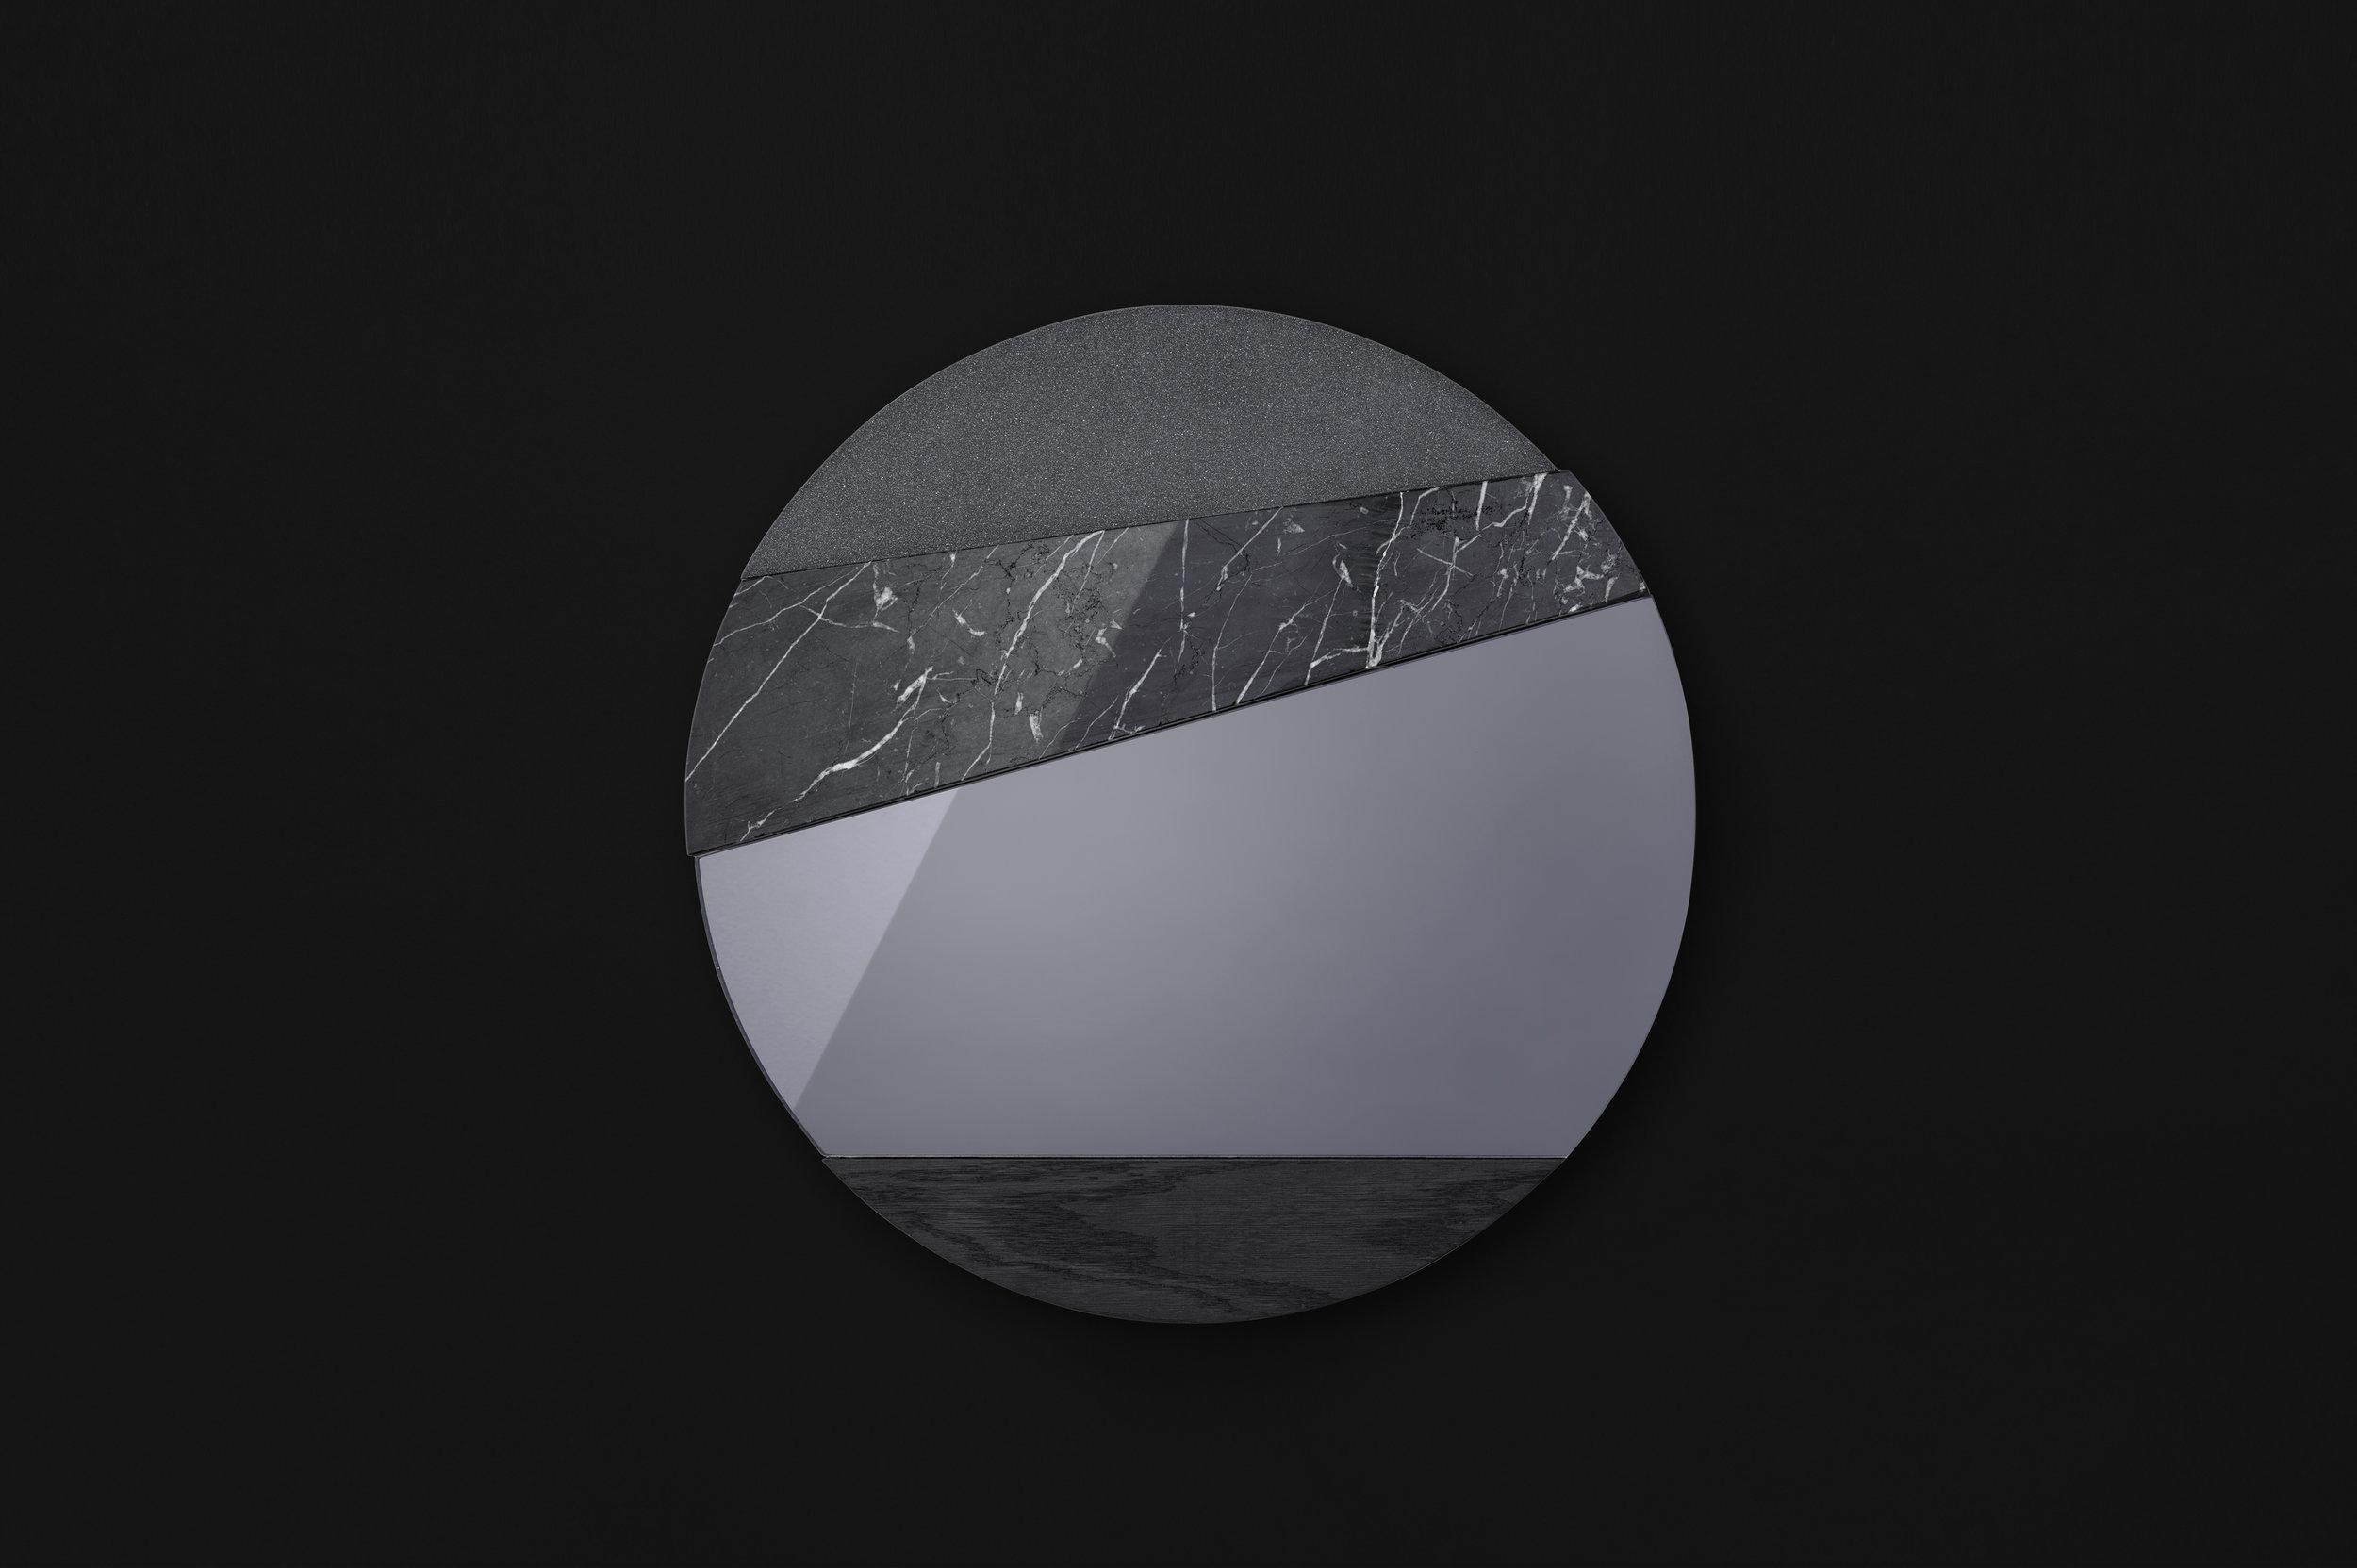 cooperativa-panoramica-mono-4-mirror.jpg